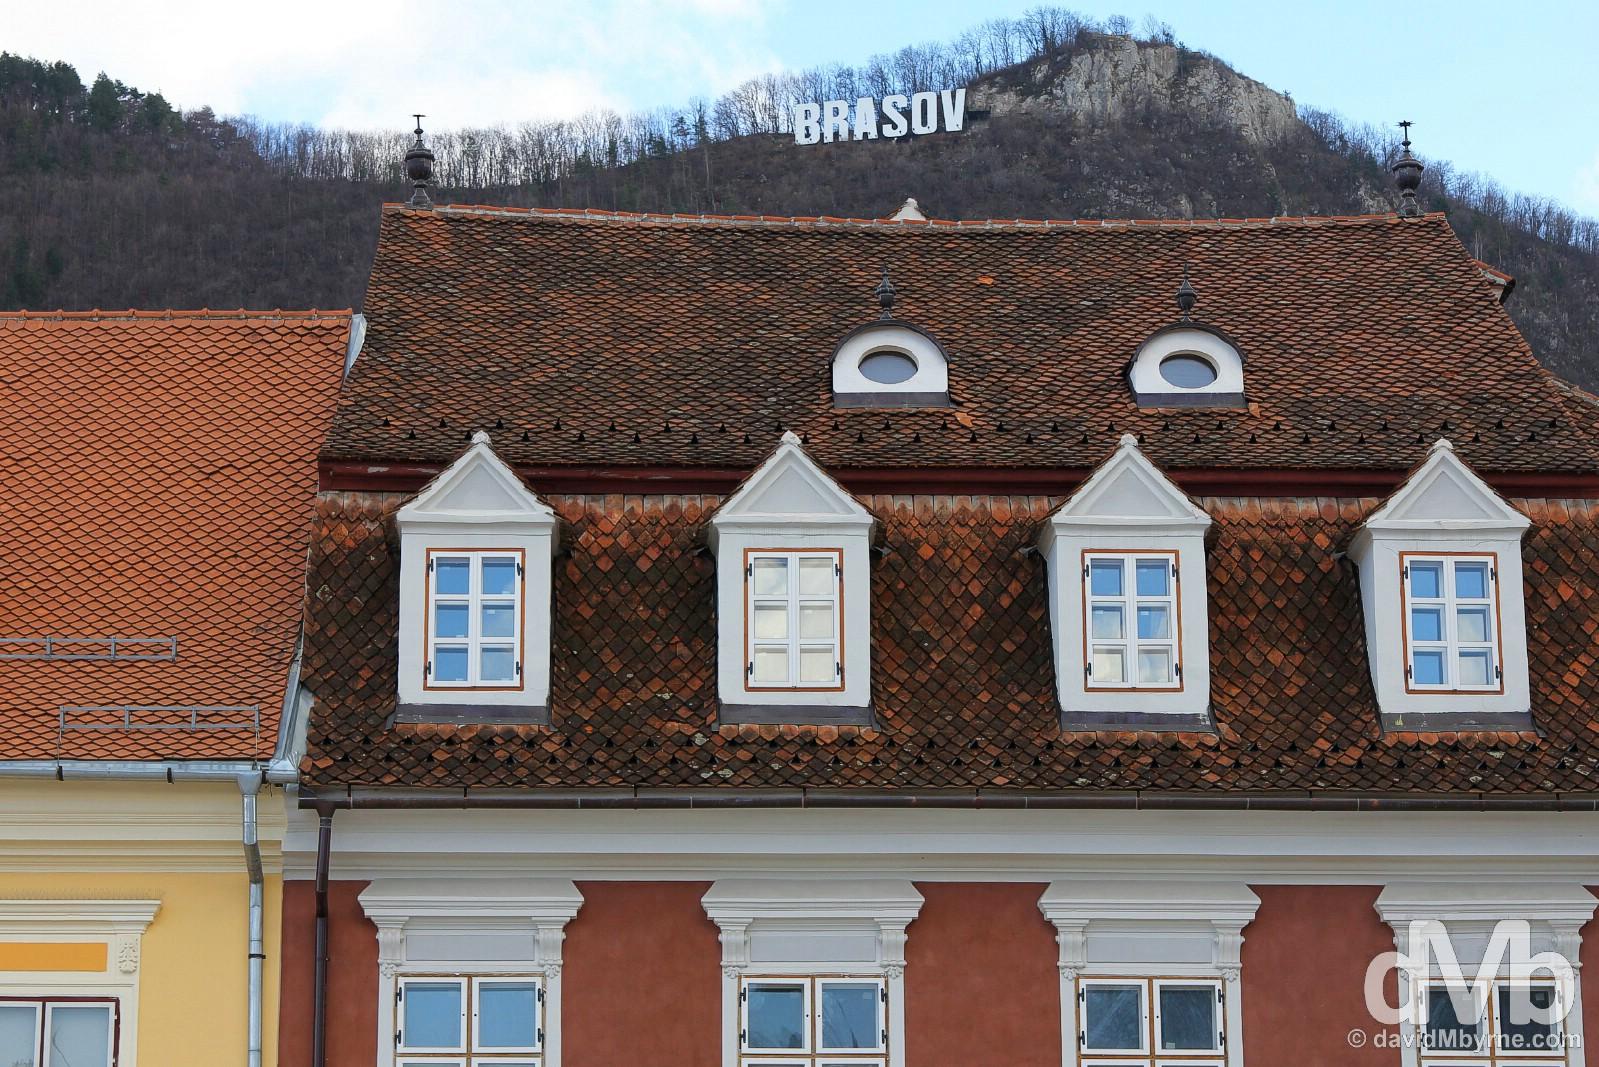 Brasov, Transylvania, Romania. April 2, 2015.